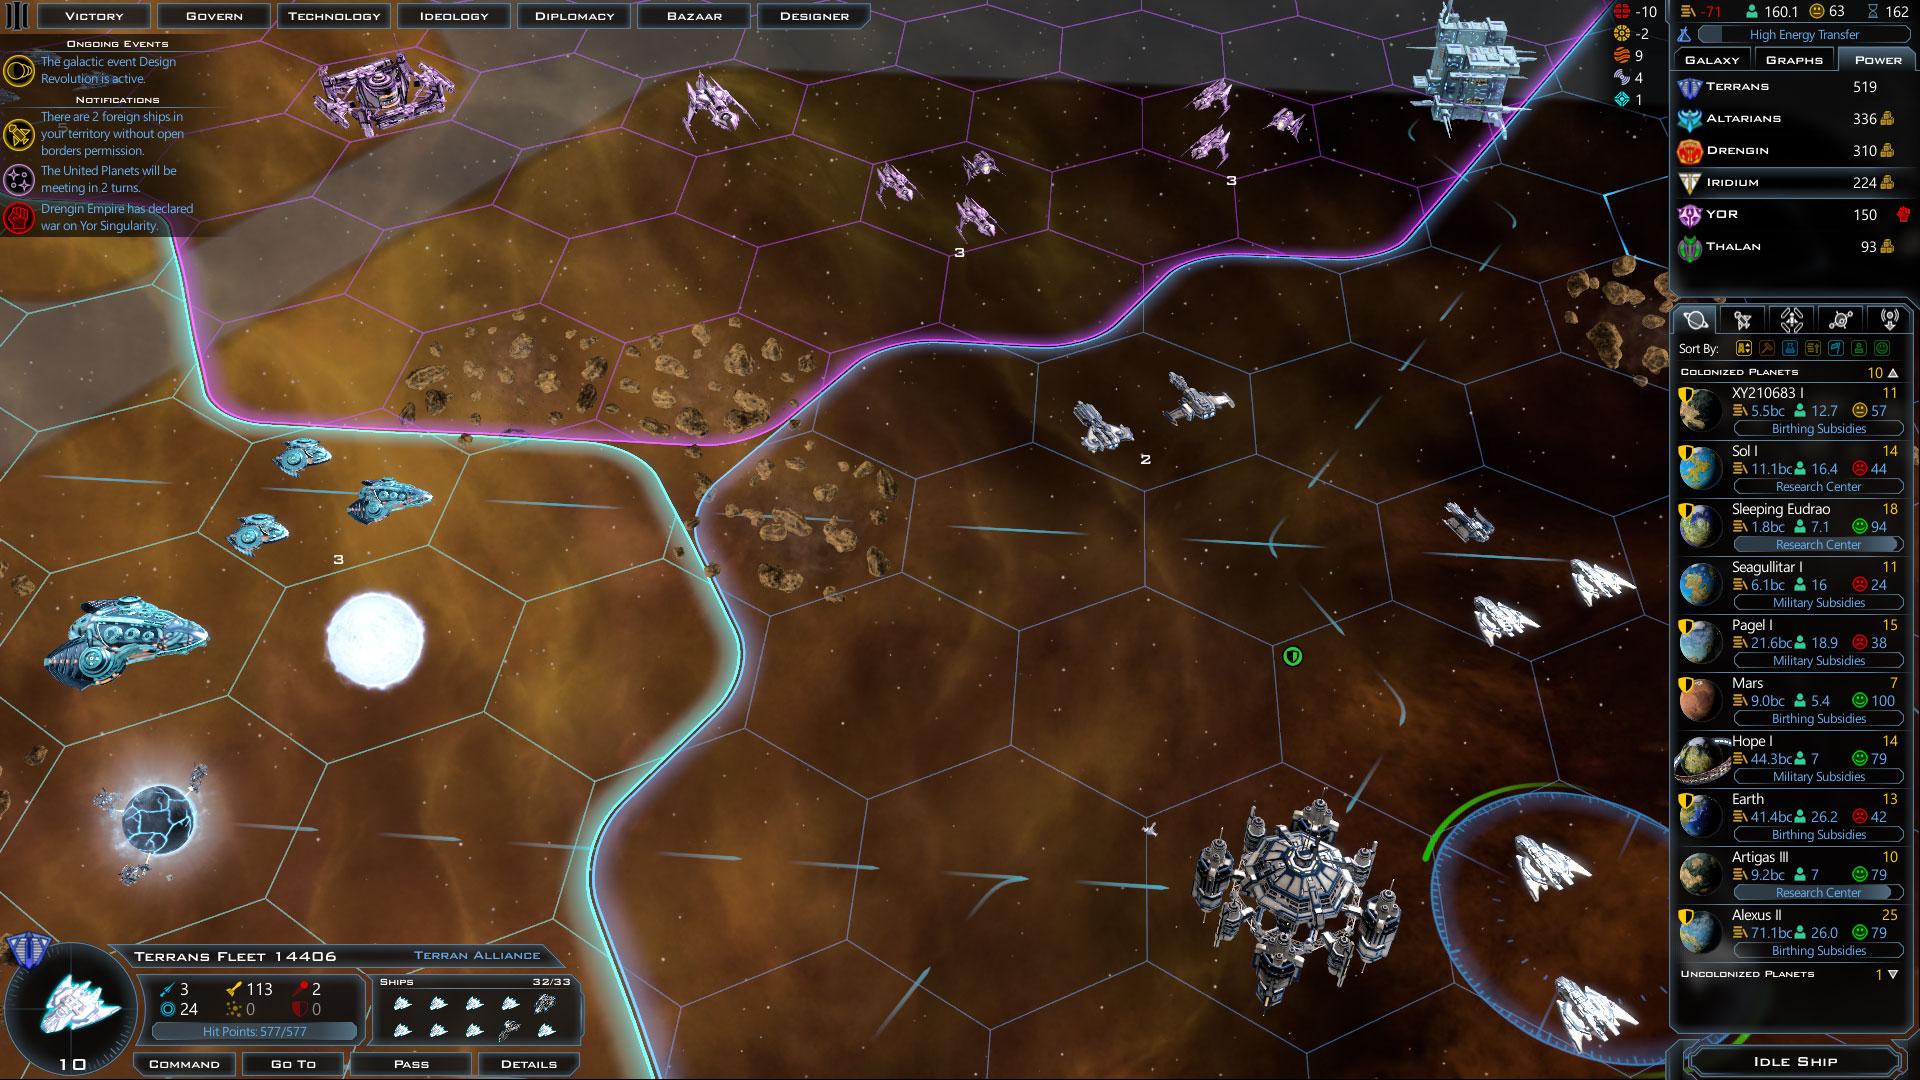 Store: Galactic Civilizations III